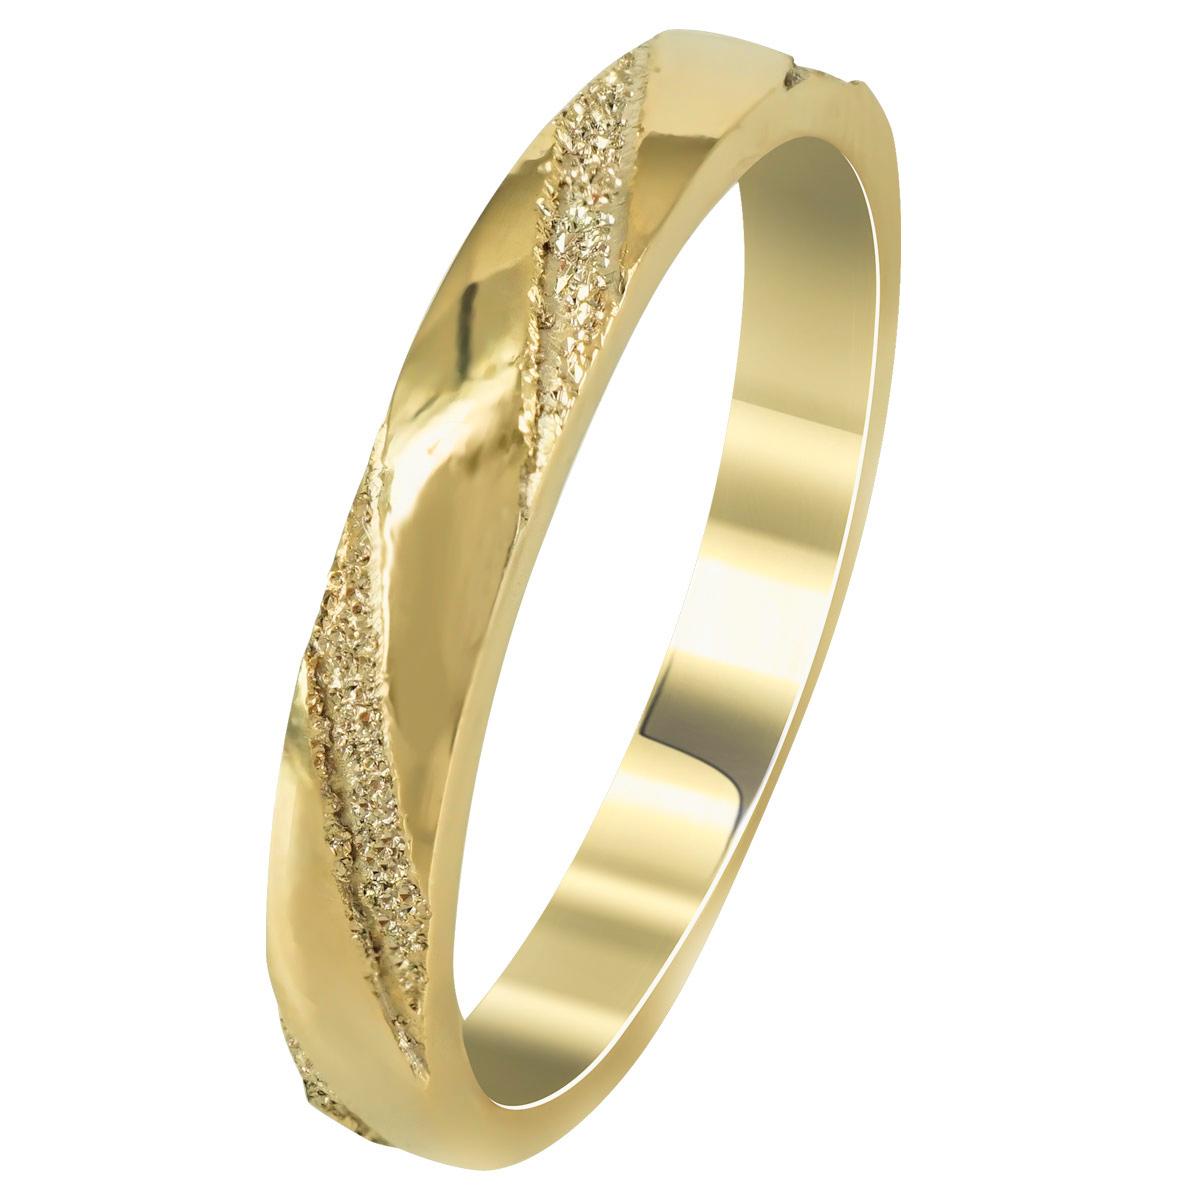 Kίτρινη Χρυσή Βέρα Γάμου WR261 k14